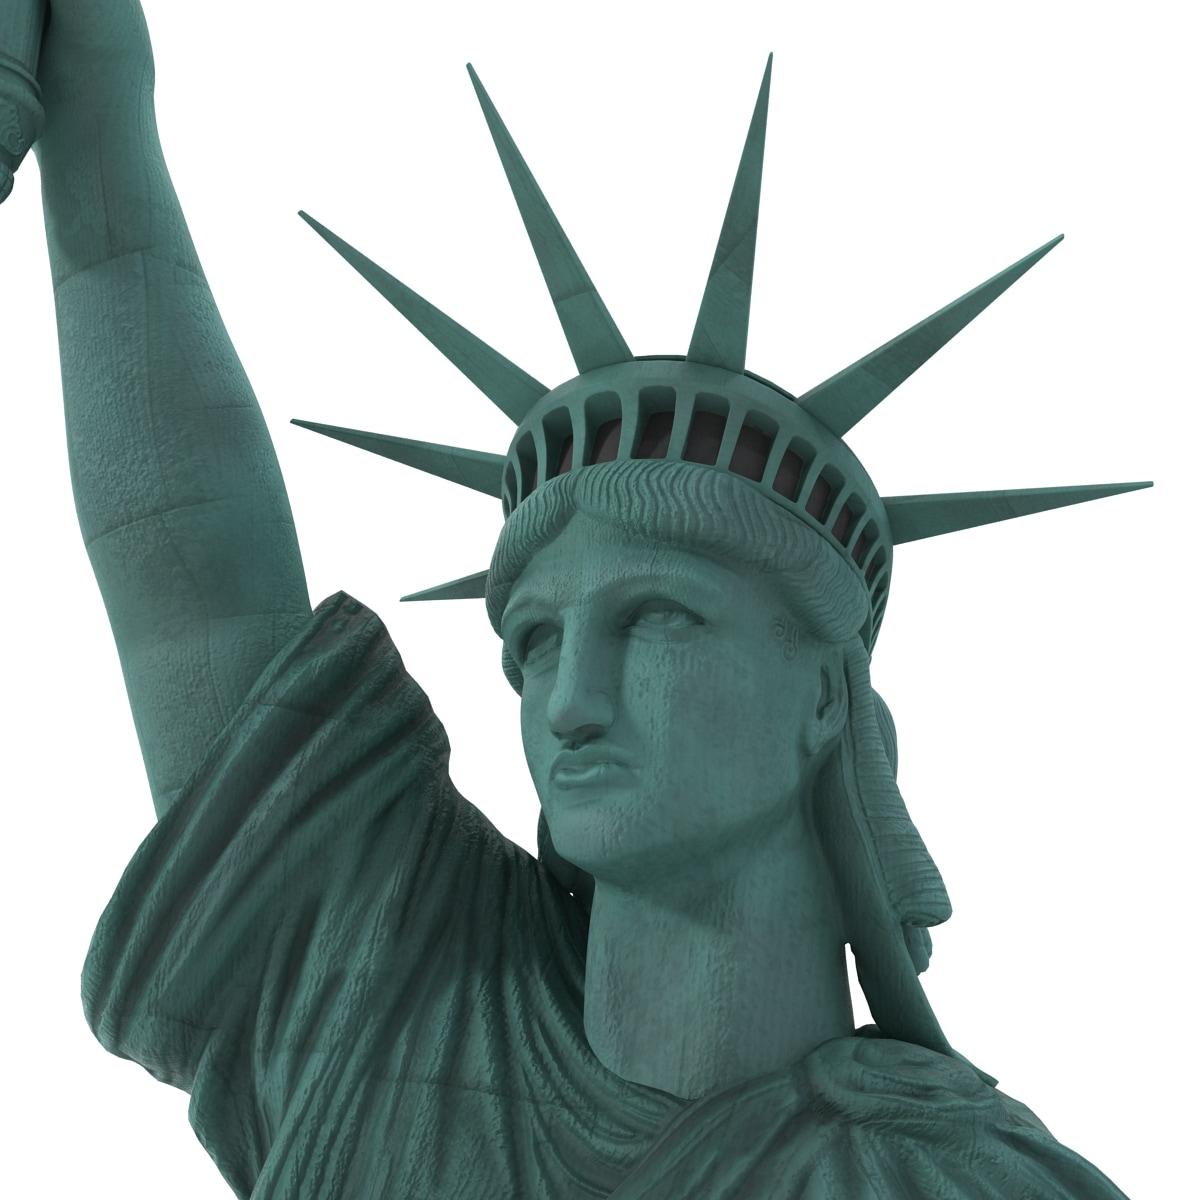 Statue_of_Liberty_2_031.jpg